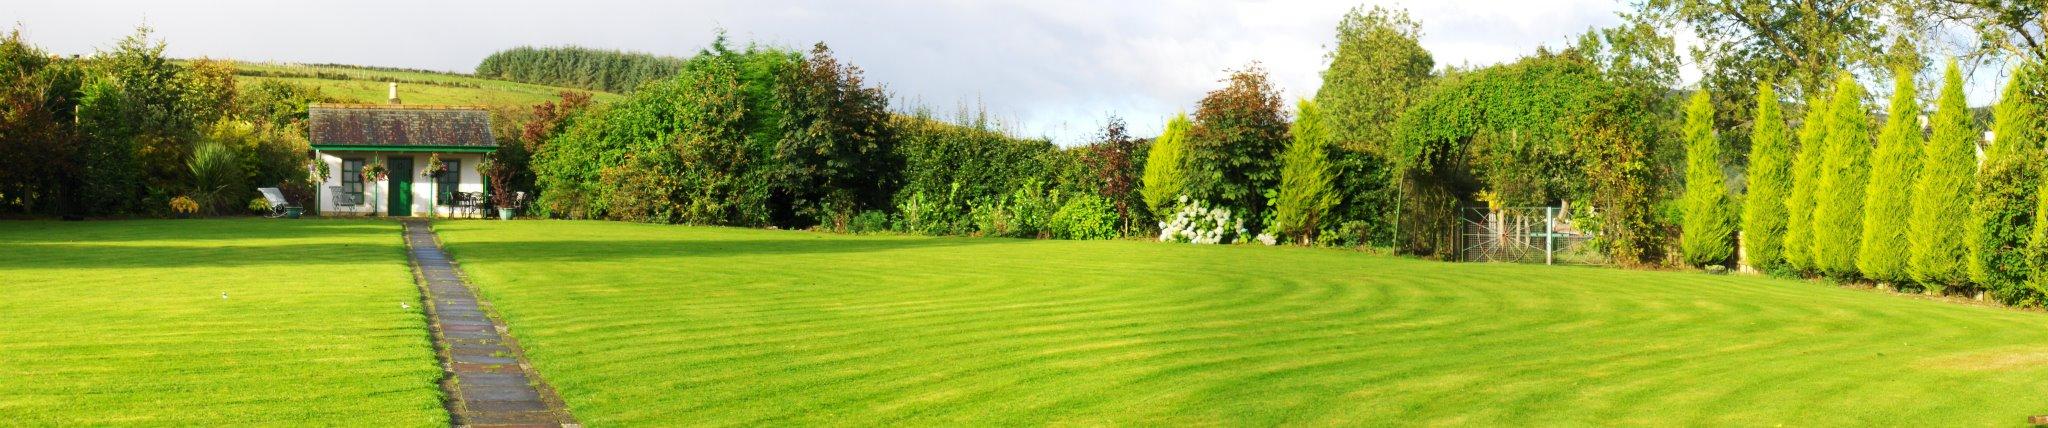 Camping Northern Ireland - Big Open Garden